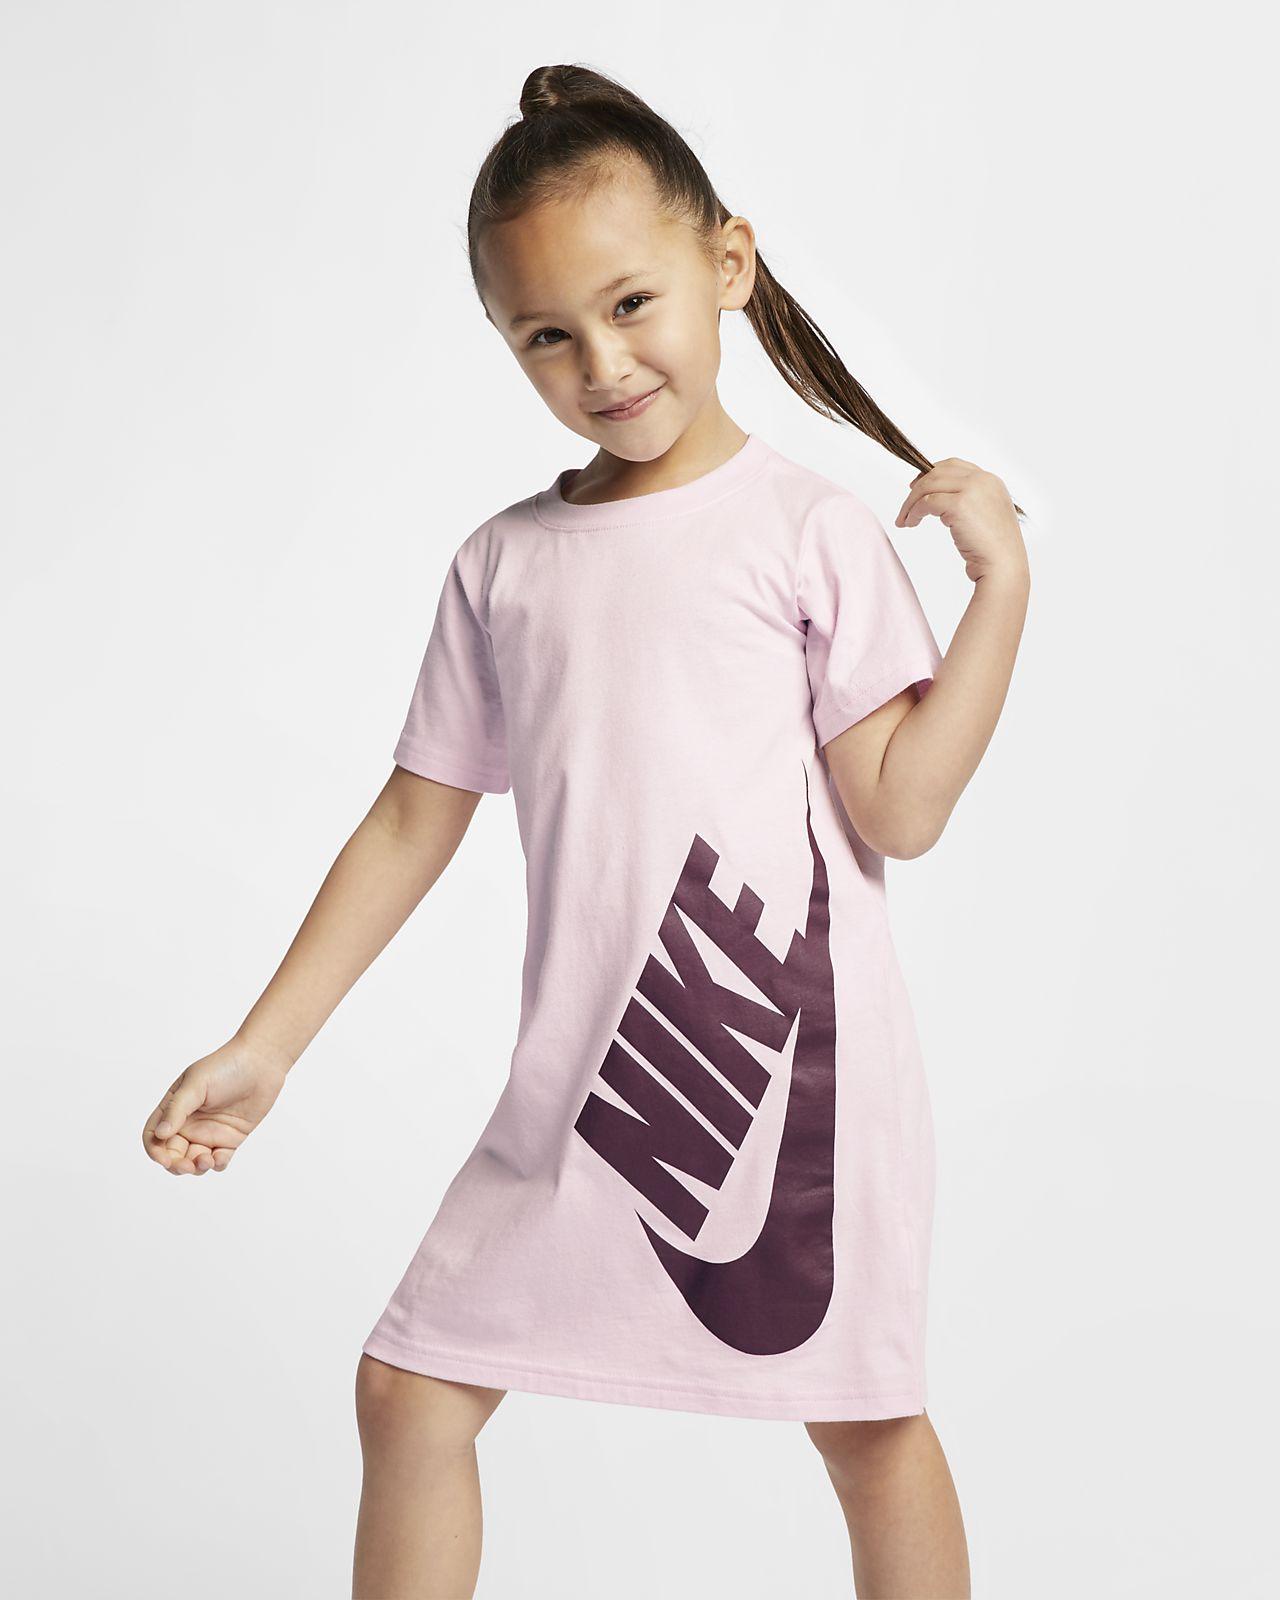 Nike Sportswear 幼童连衣裙